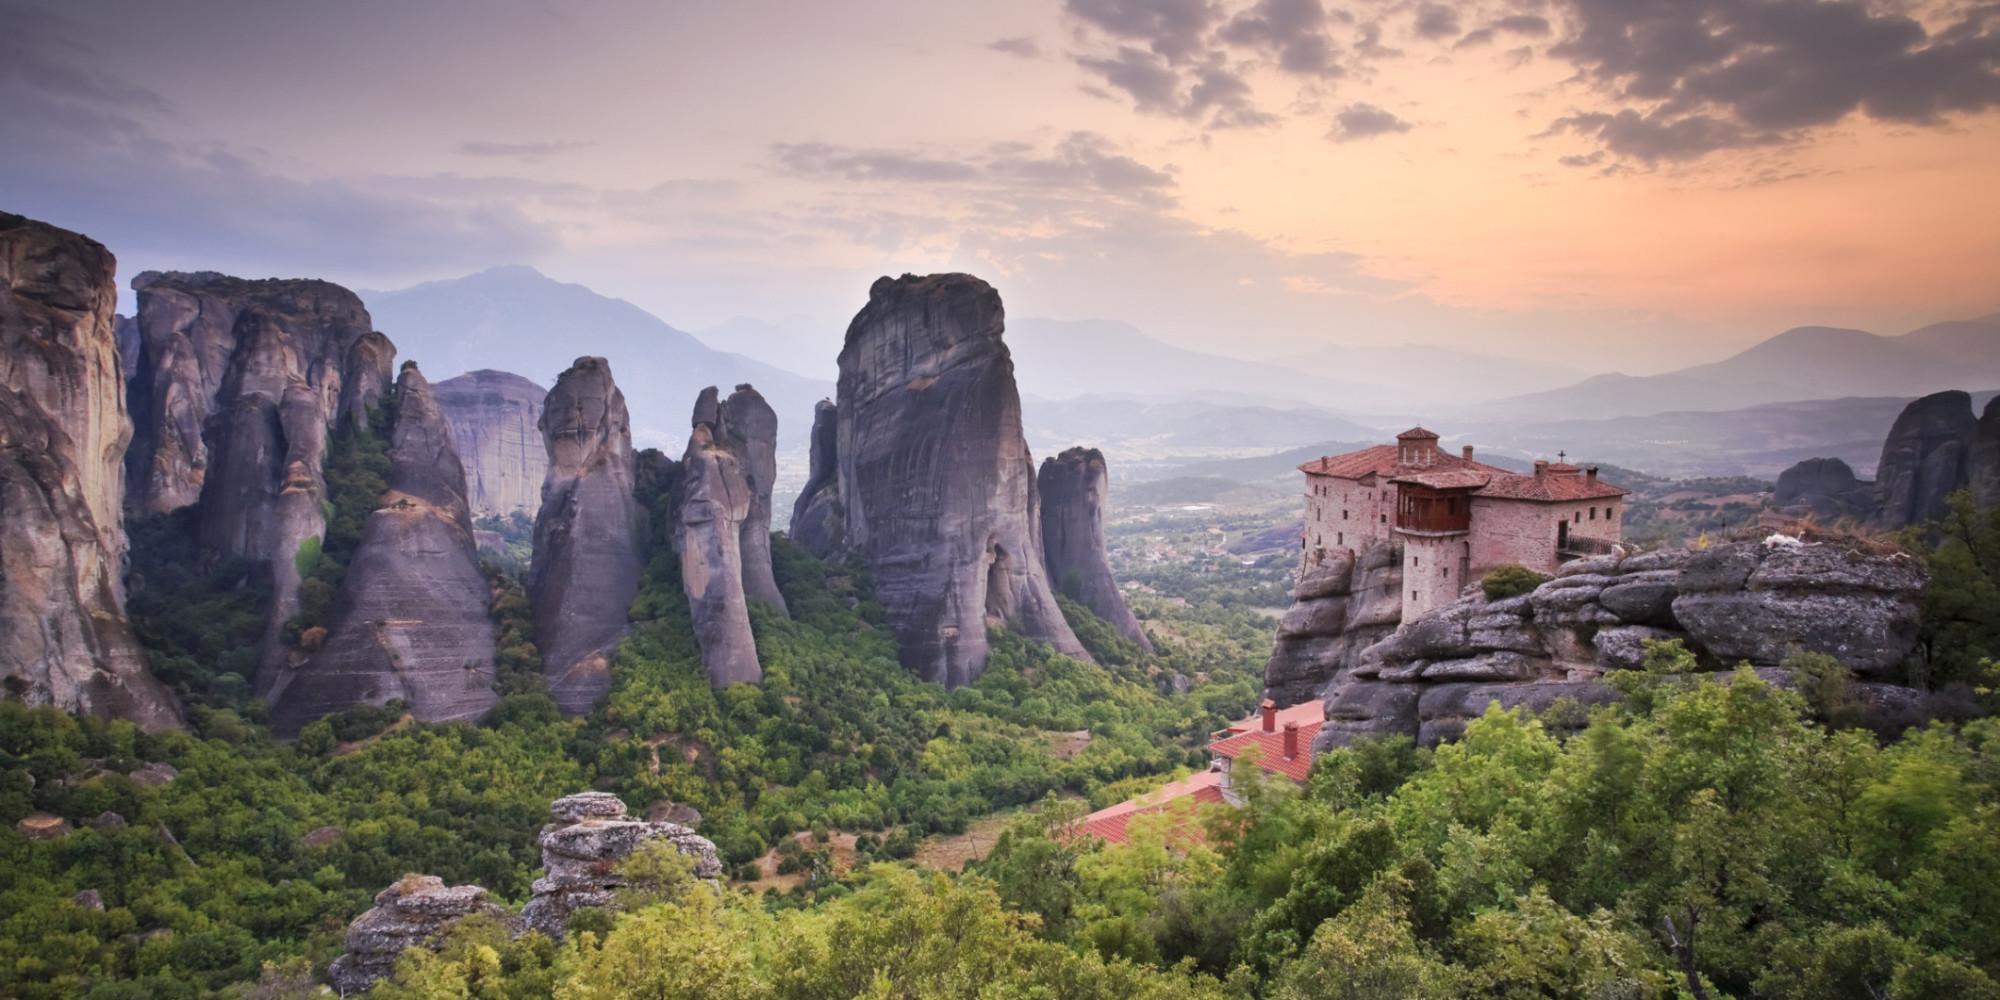 Meteora & monasteries